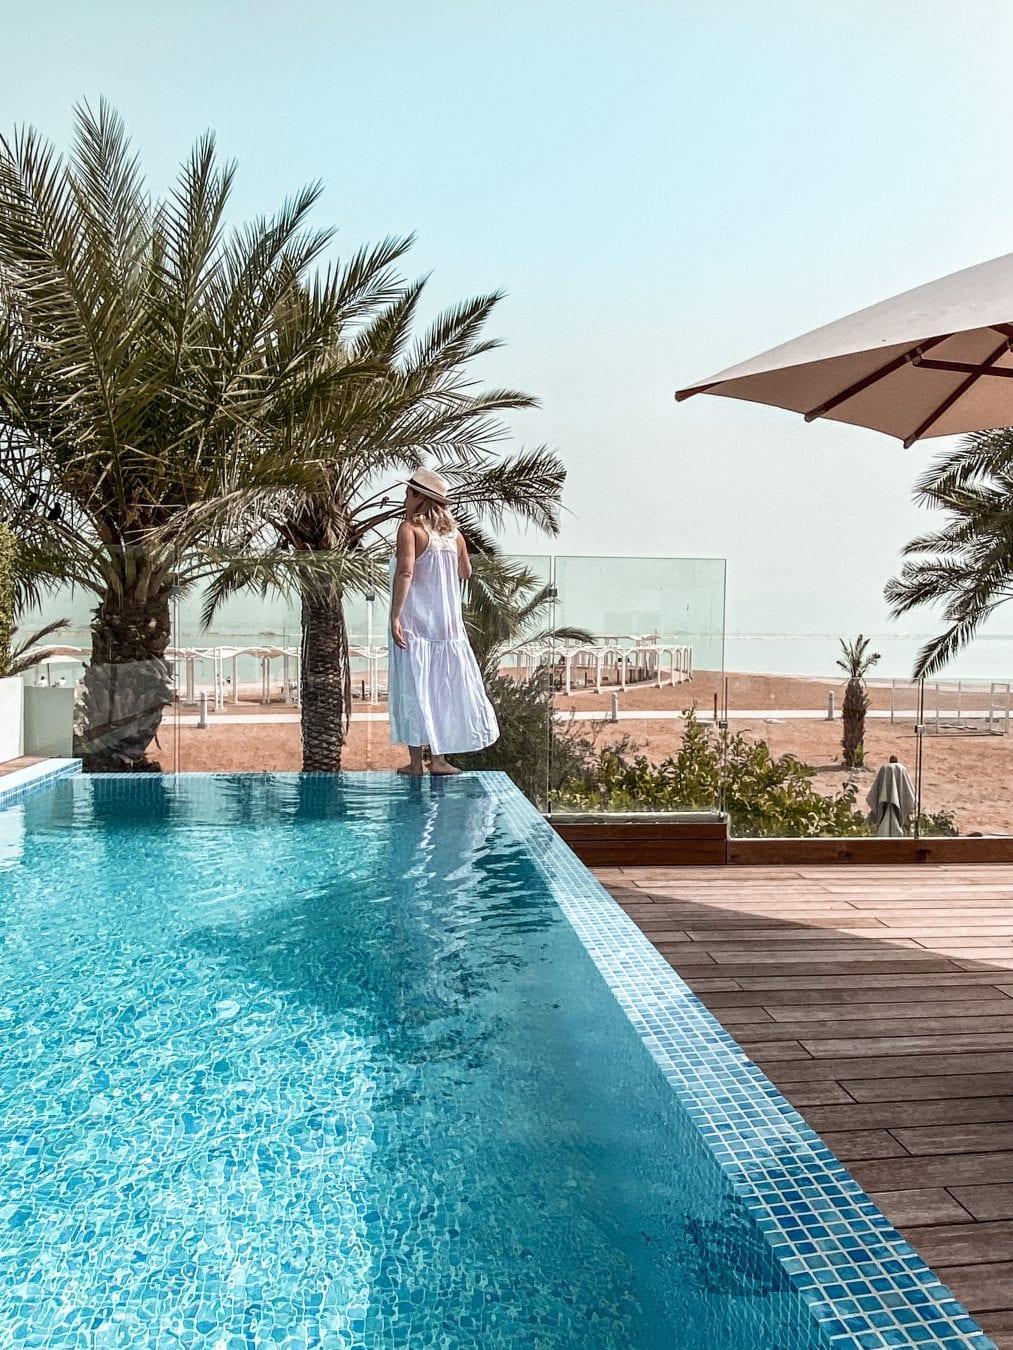 Dead Sea Milos hotel Israel מילוס ים המלח